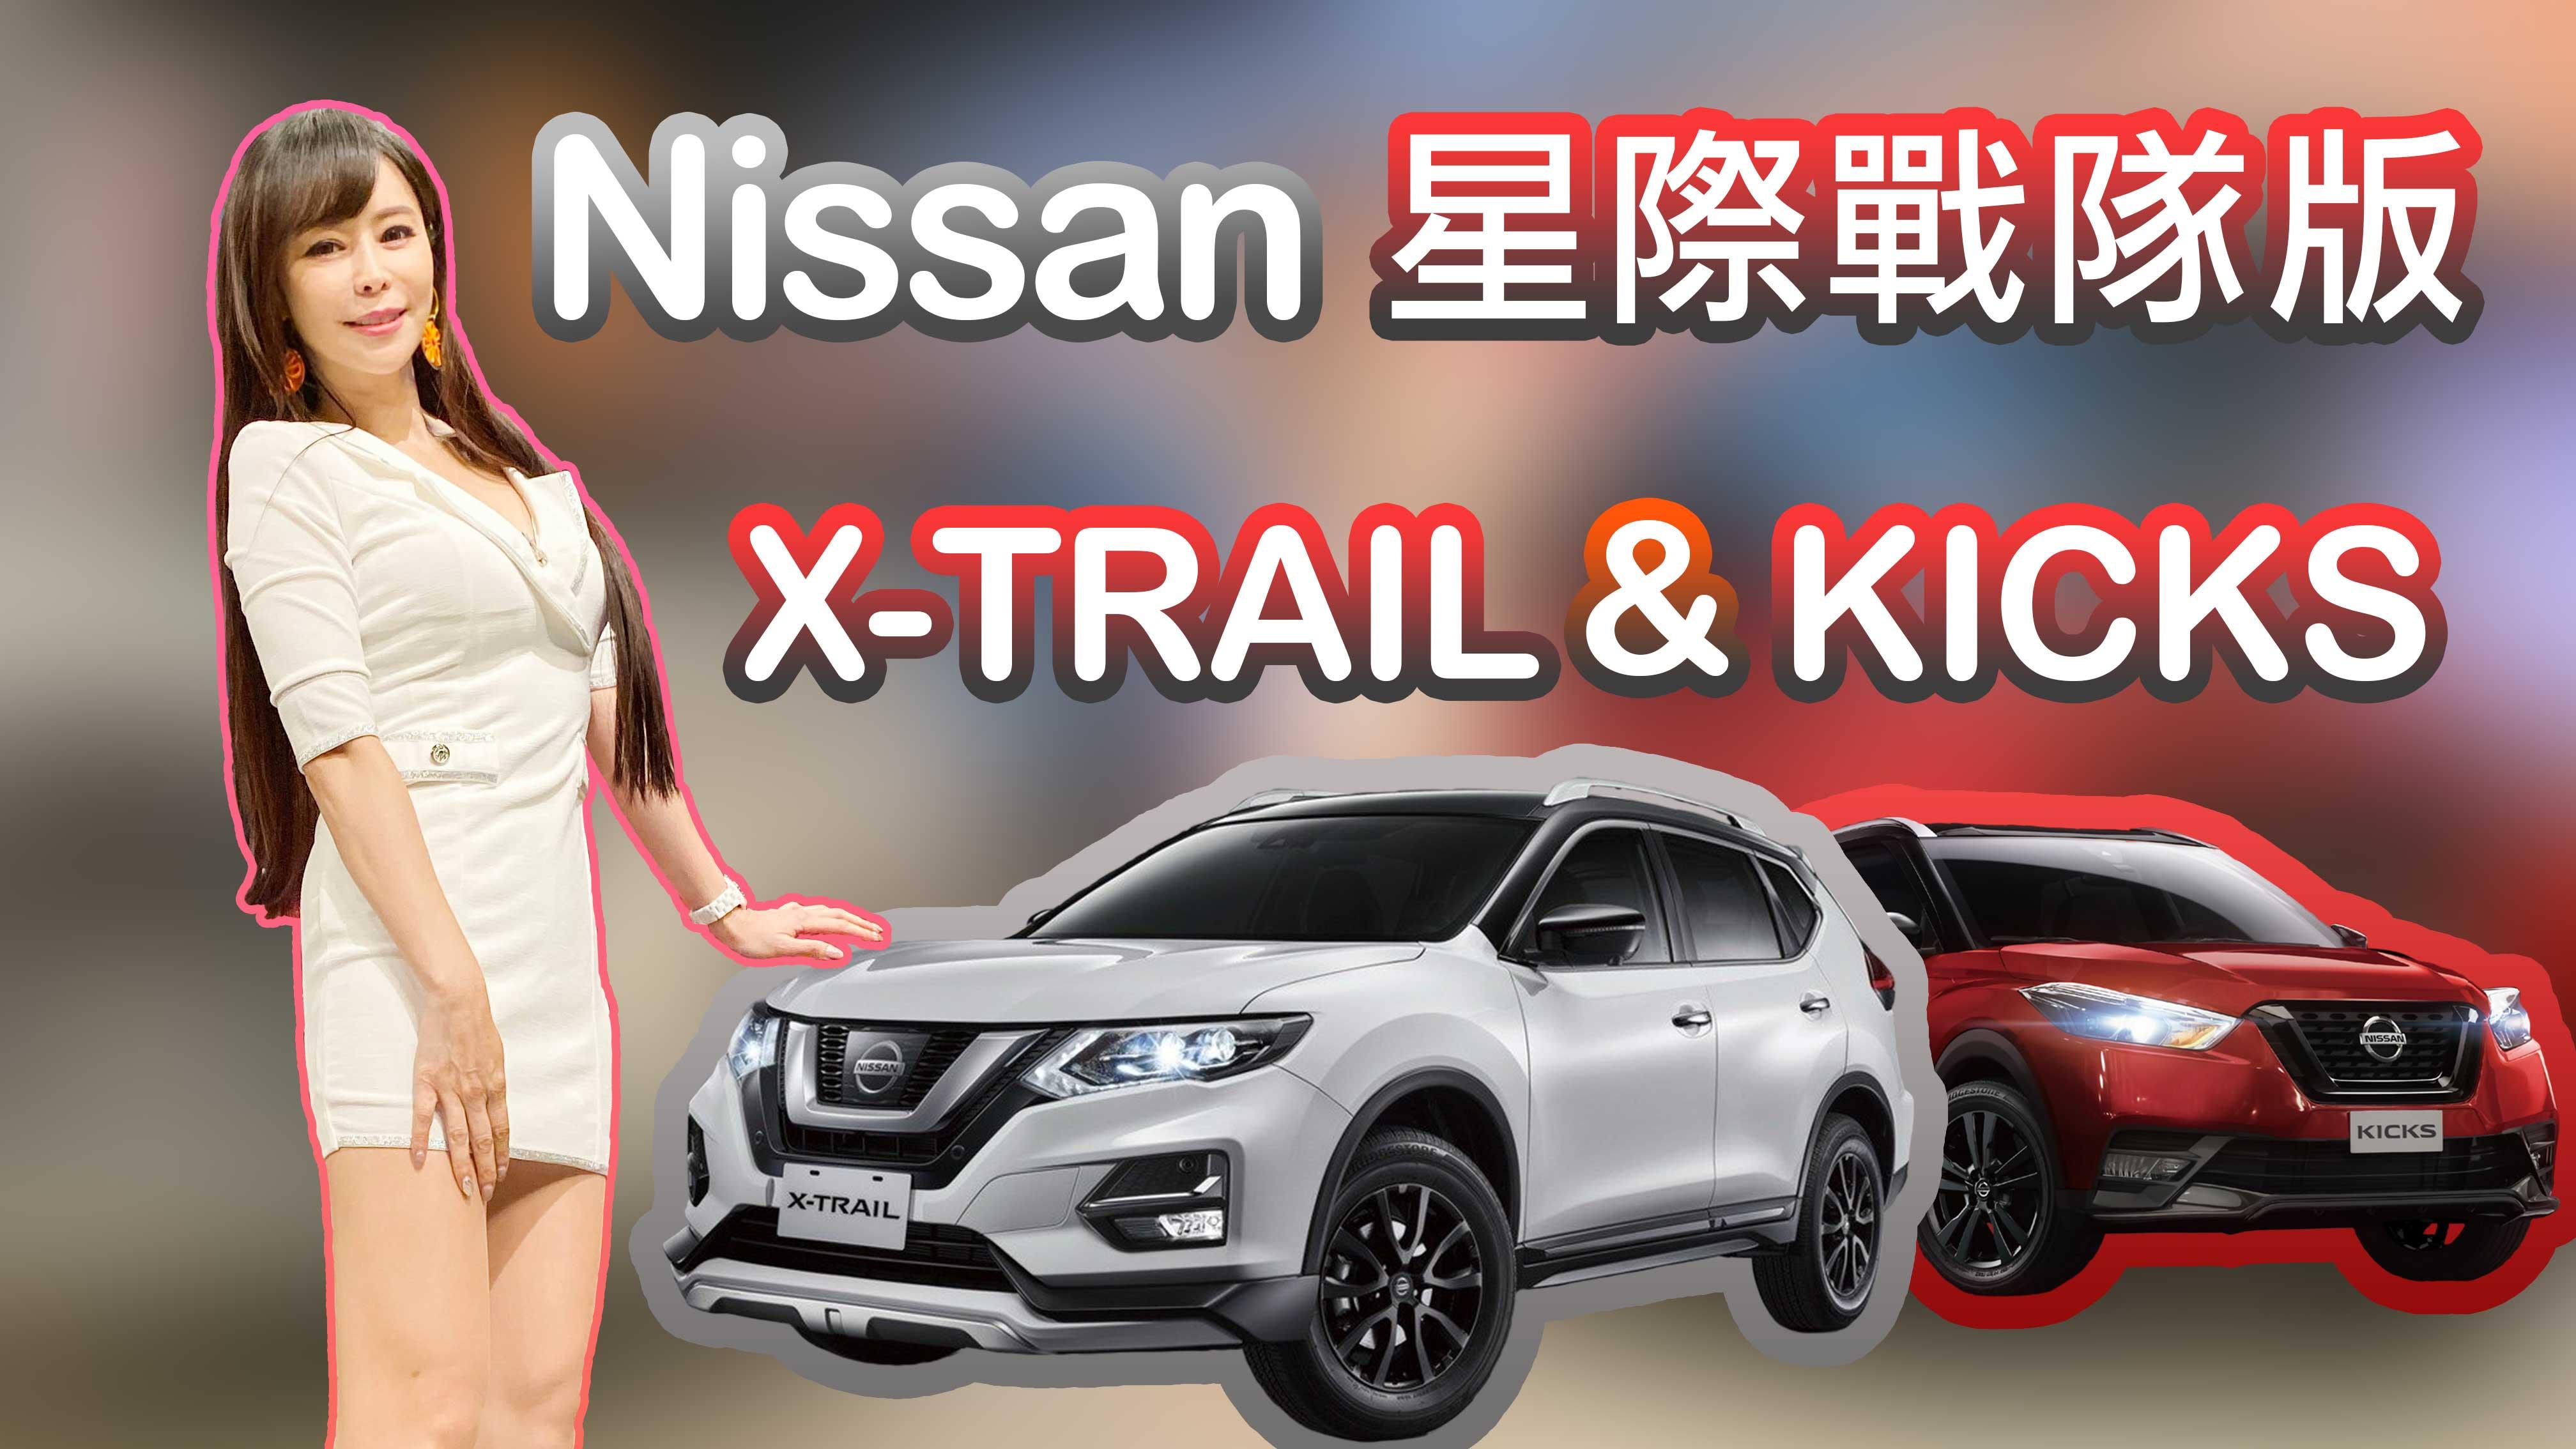 【♀︎冠儀速報】再不拍就來不及了!冠儀錄影撥空拍車|Nissan X-TRAIL、KICKS 星戰版